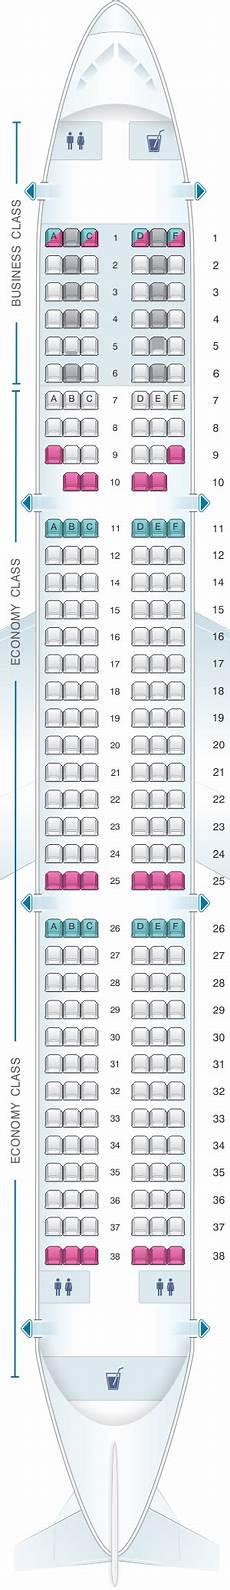 Iberia 2622 Seating Chart Seat Map Iberia Airbus A321 Seatmaestro